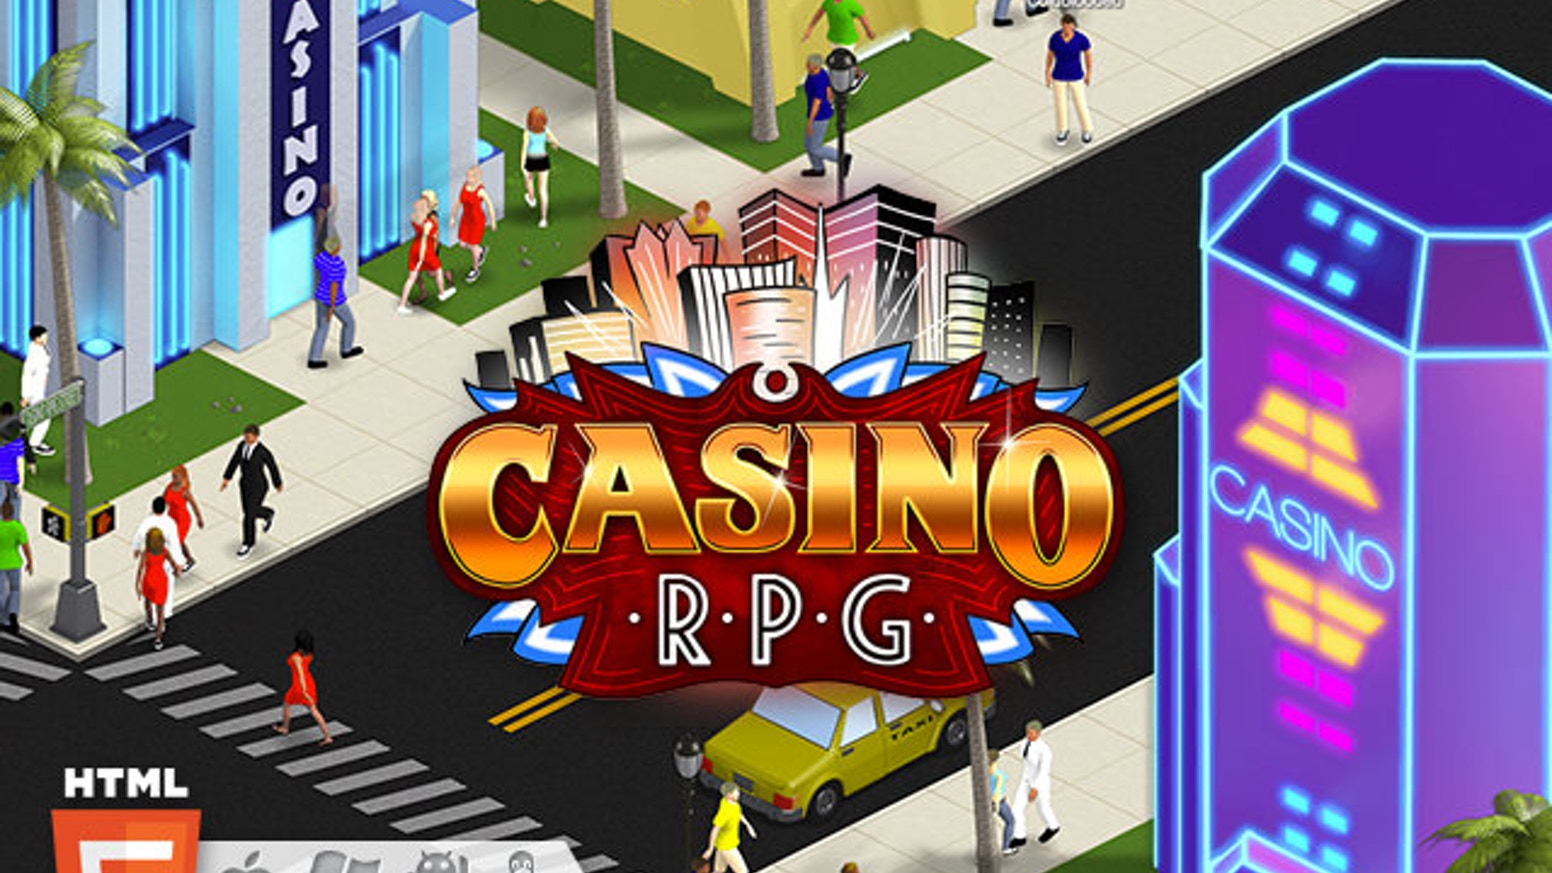 CasinoRPG by GoldFire Studios — Kickstarter